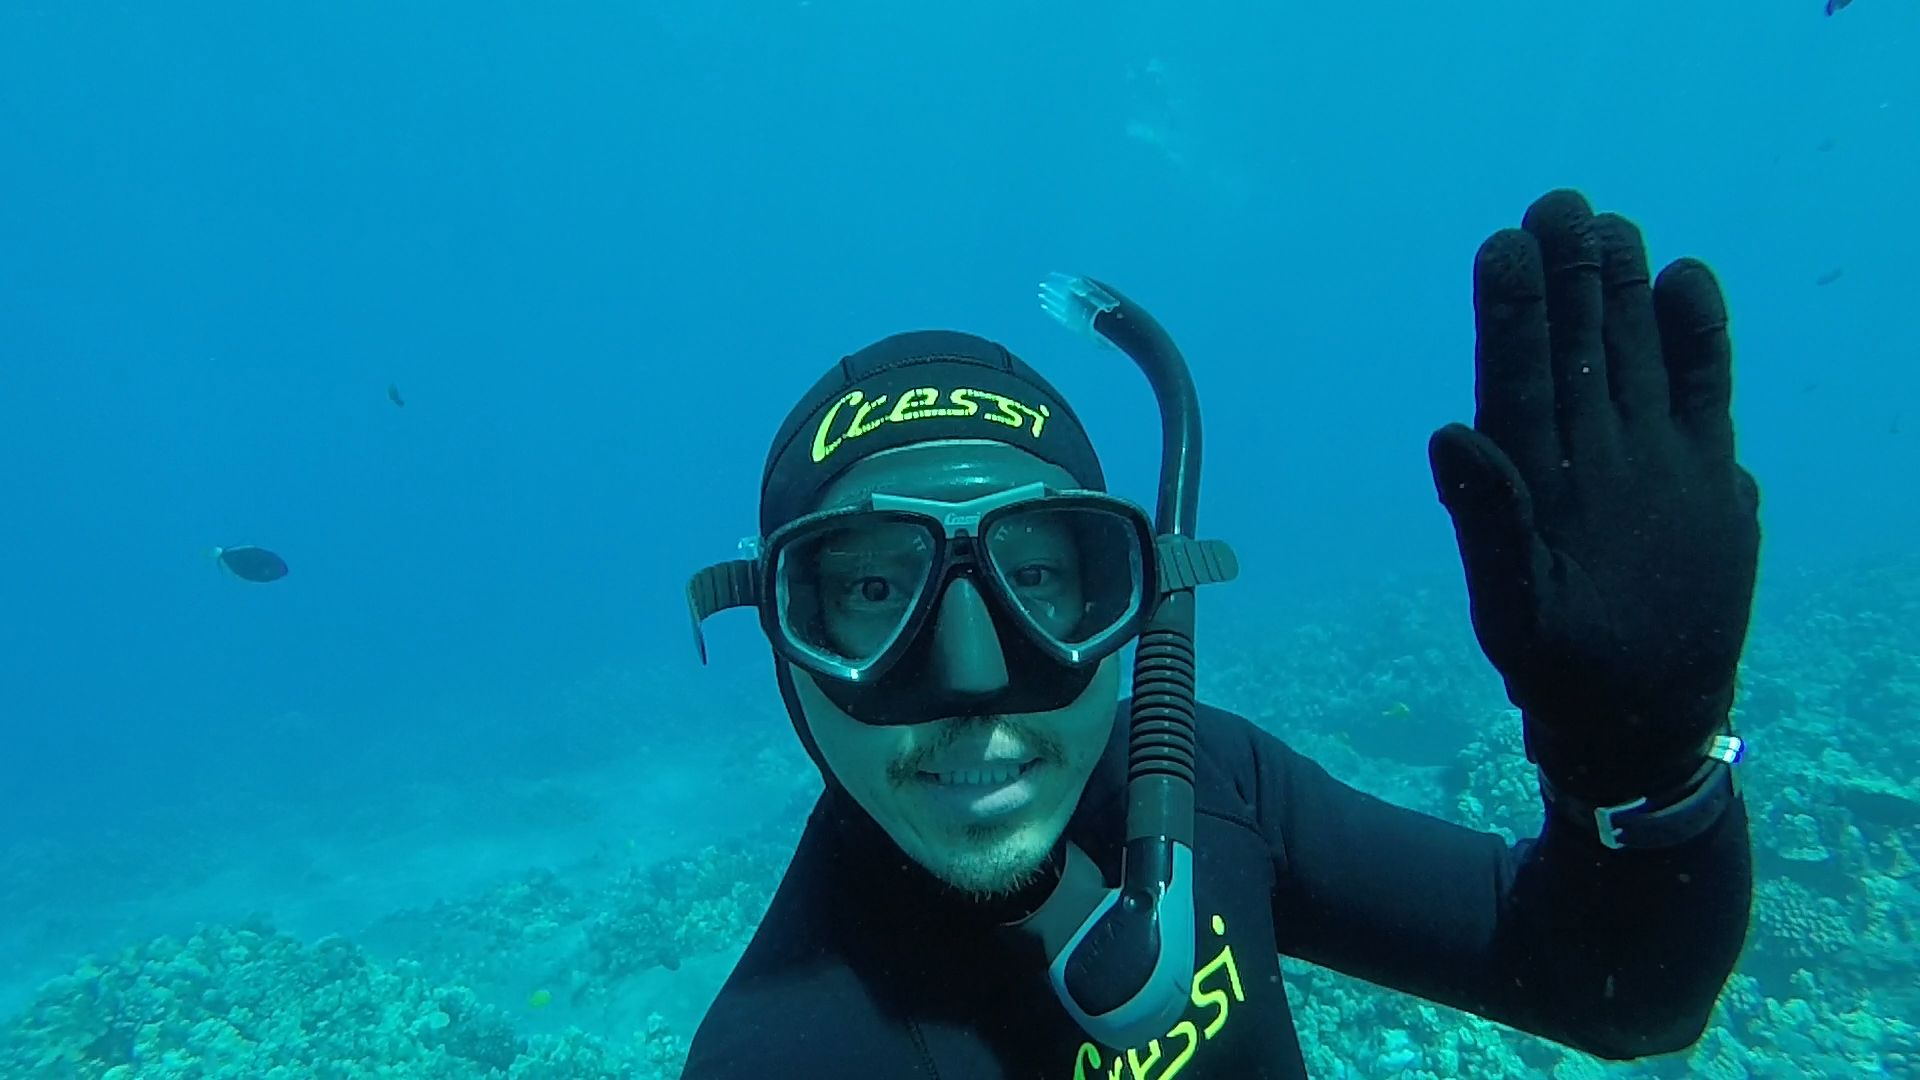 Sal snorkeling